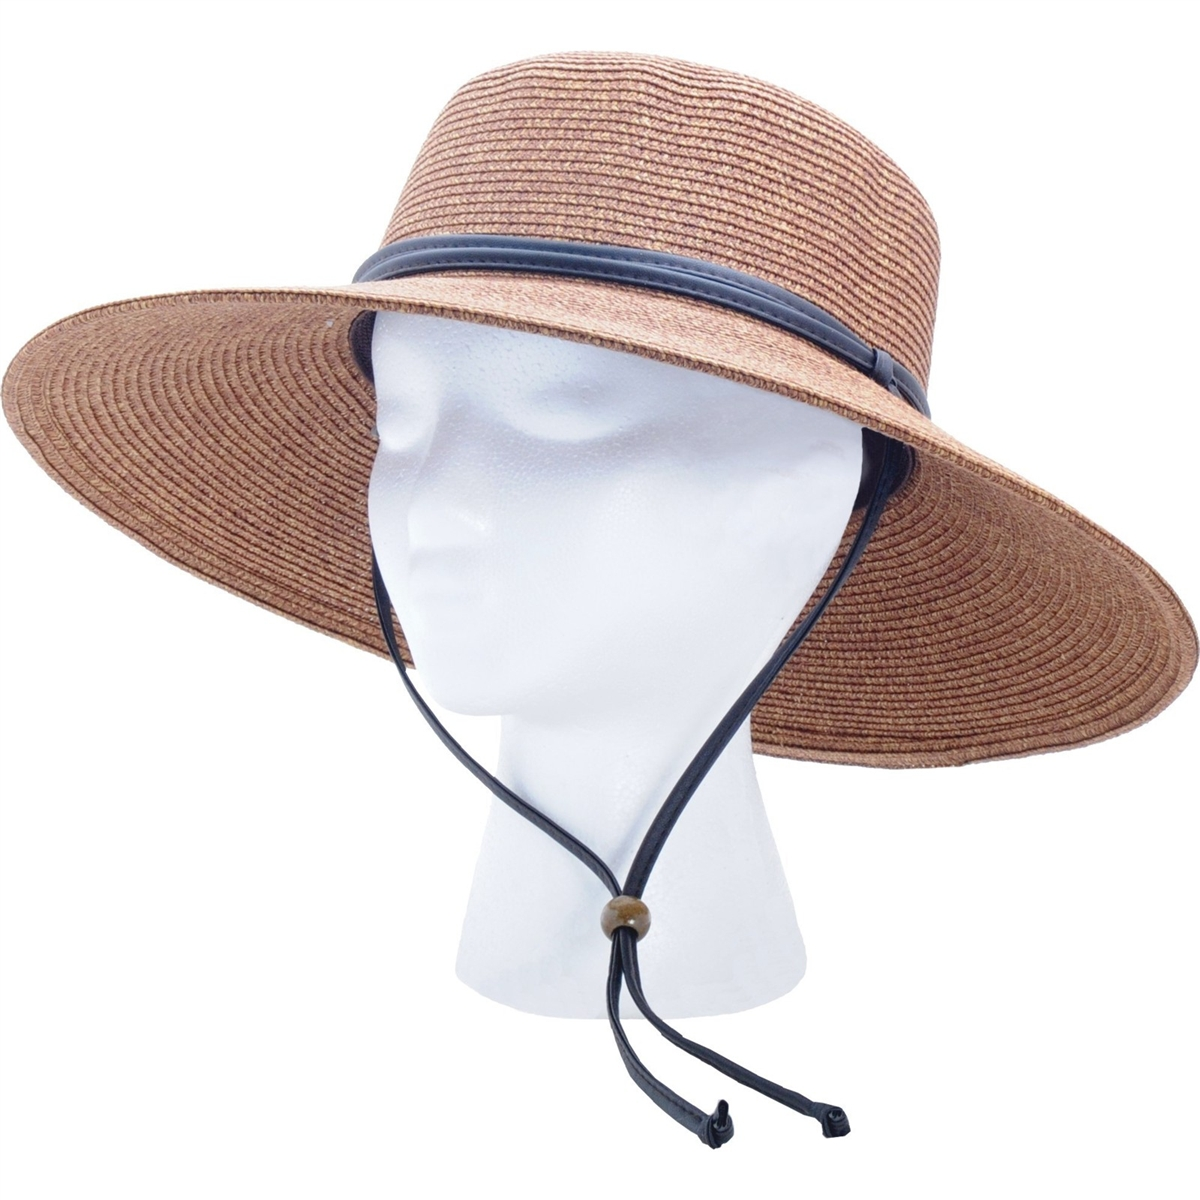 Sloggers Women S Braided Hat With Win Lanyard Dark Brown Upf 50 Maximum Sun Protection